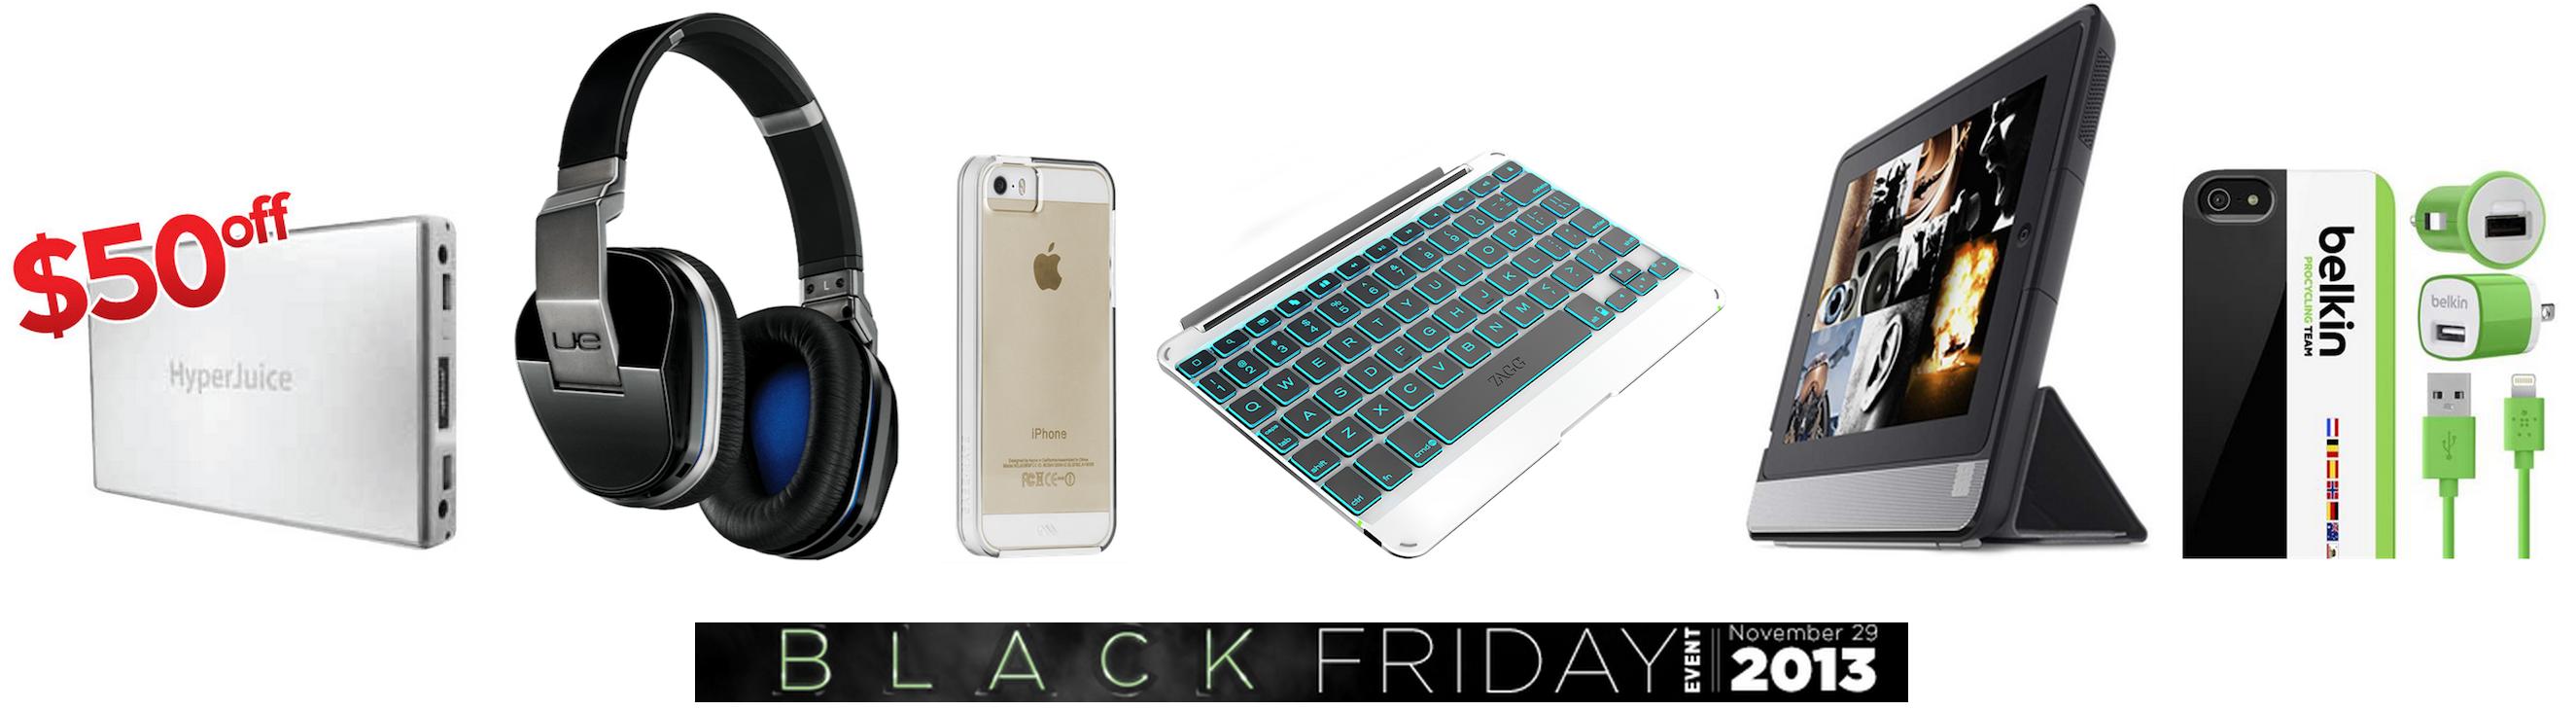 Black-Friday-Apple-roundup-02